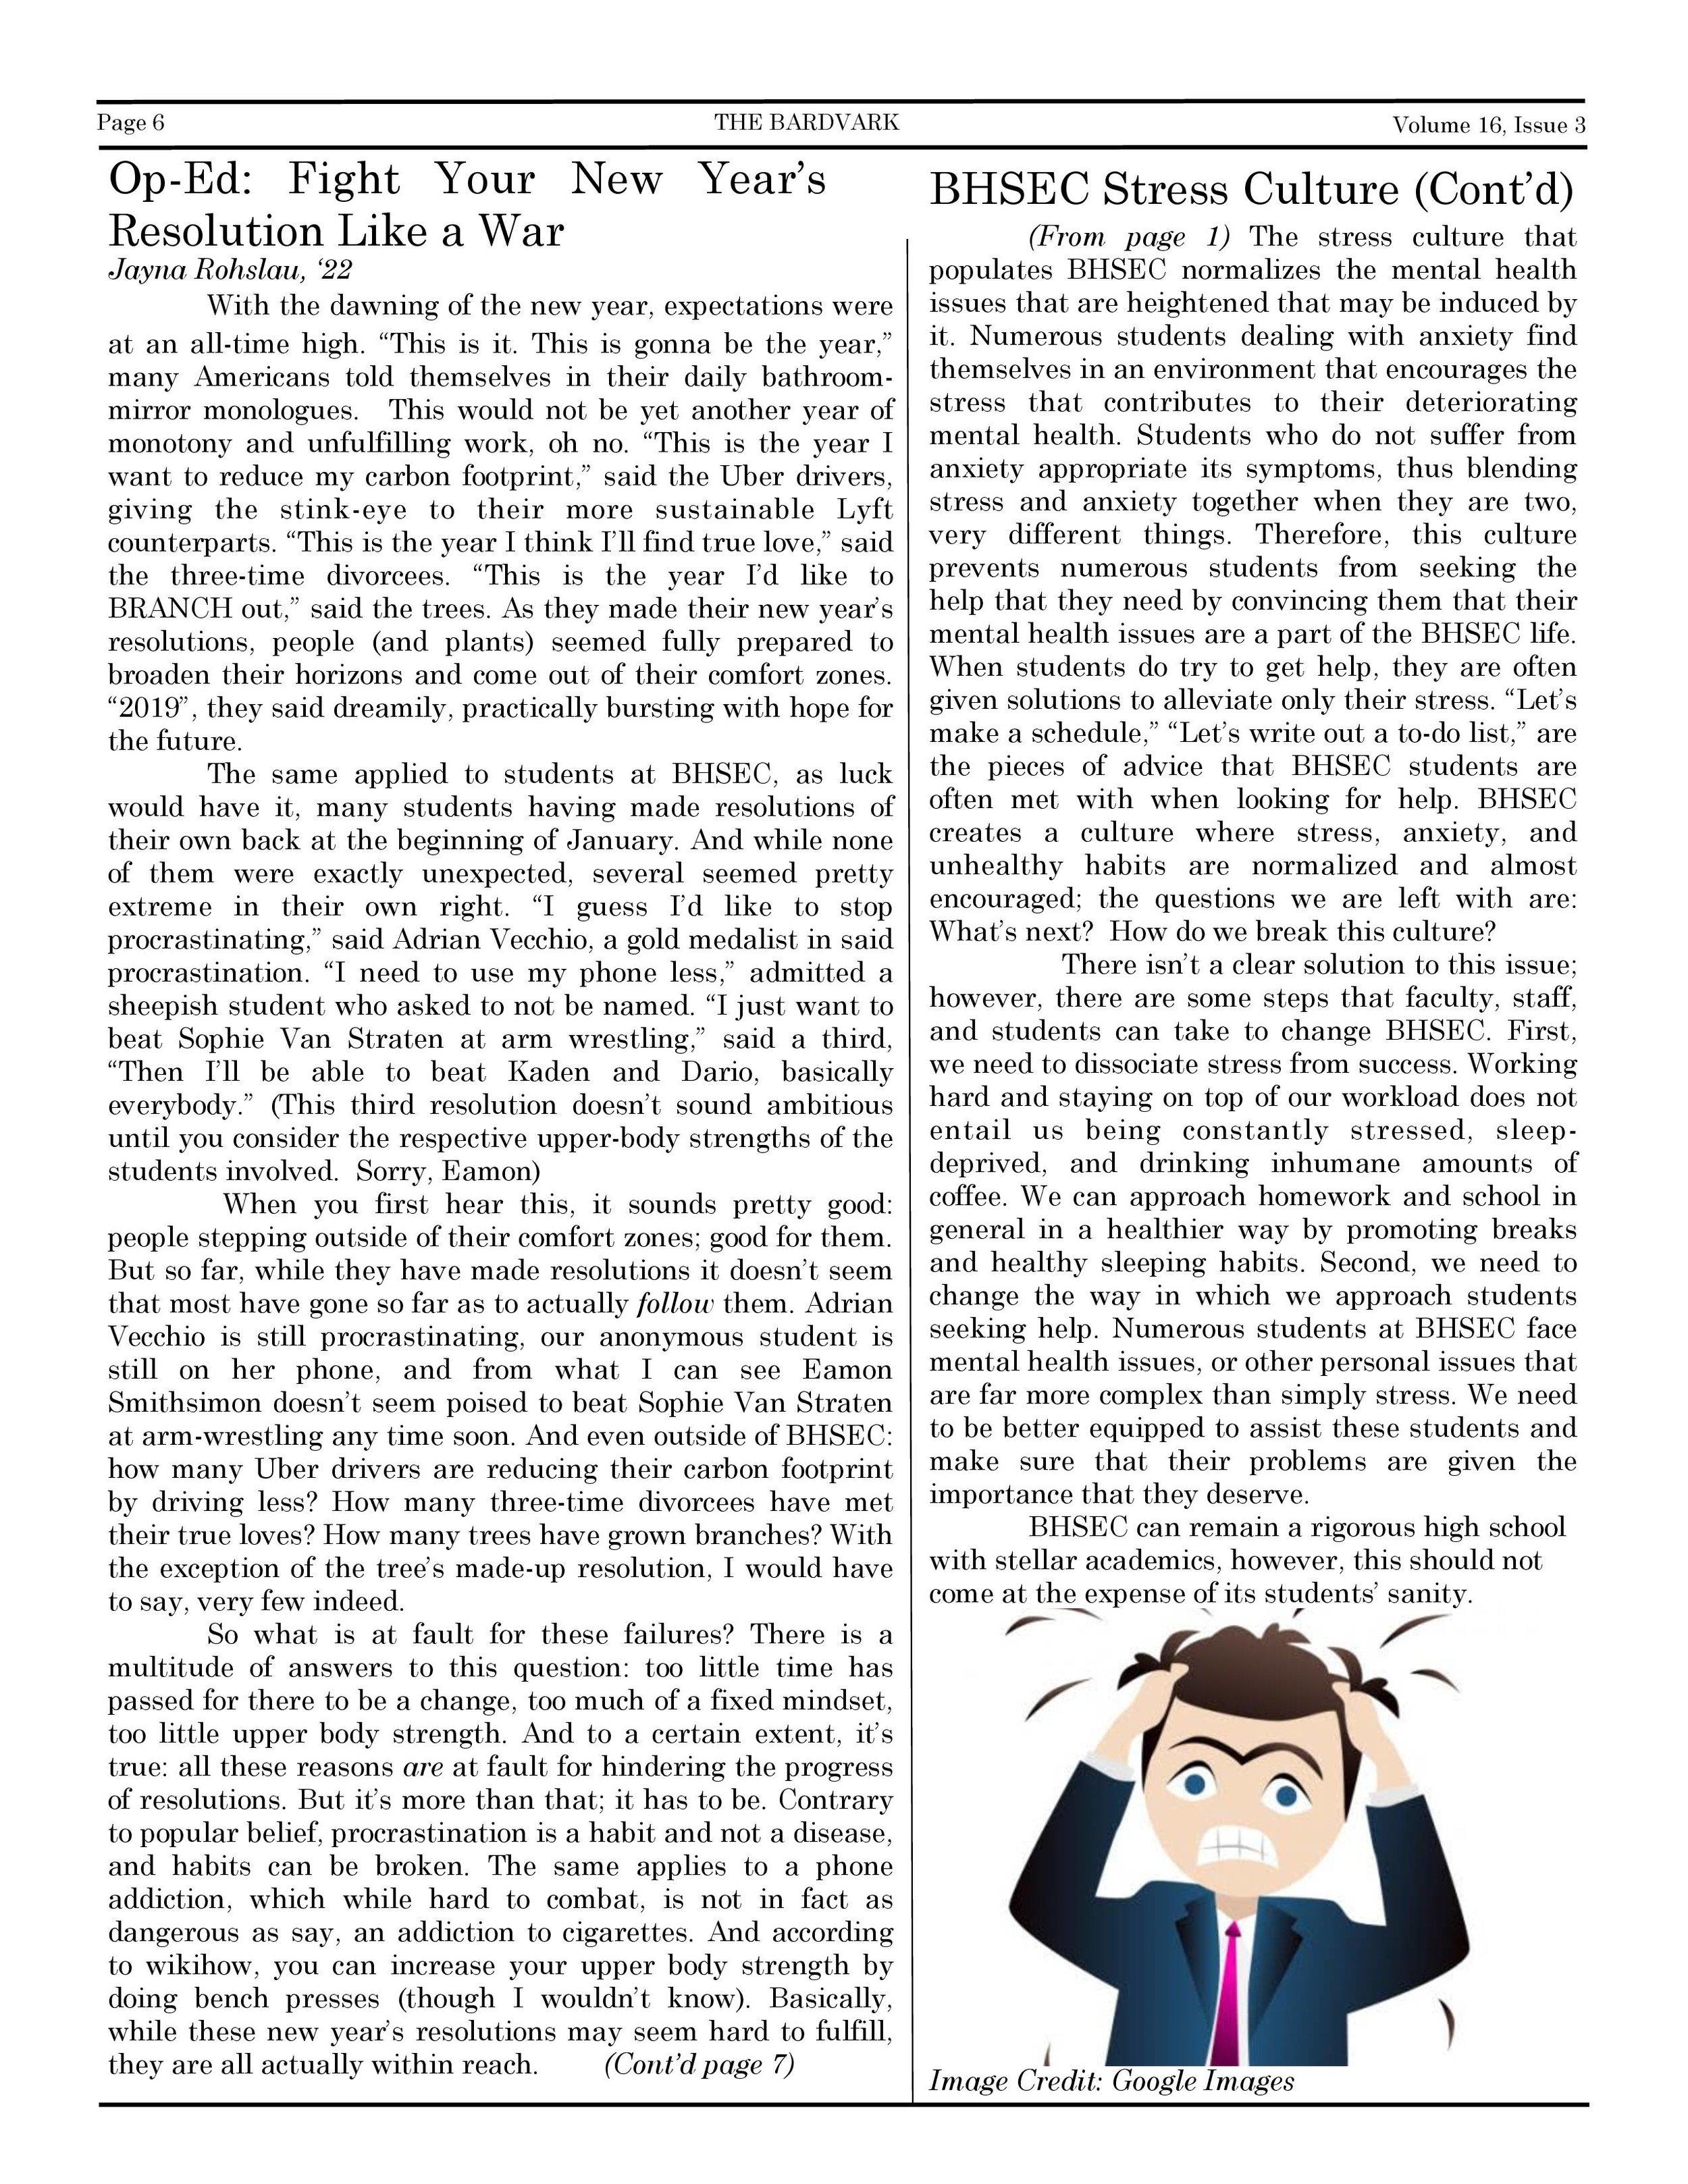 Issue 5 January 2019-6.jpg